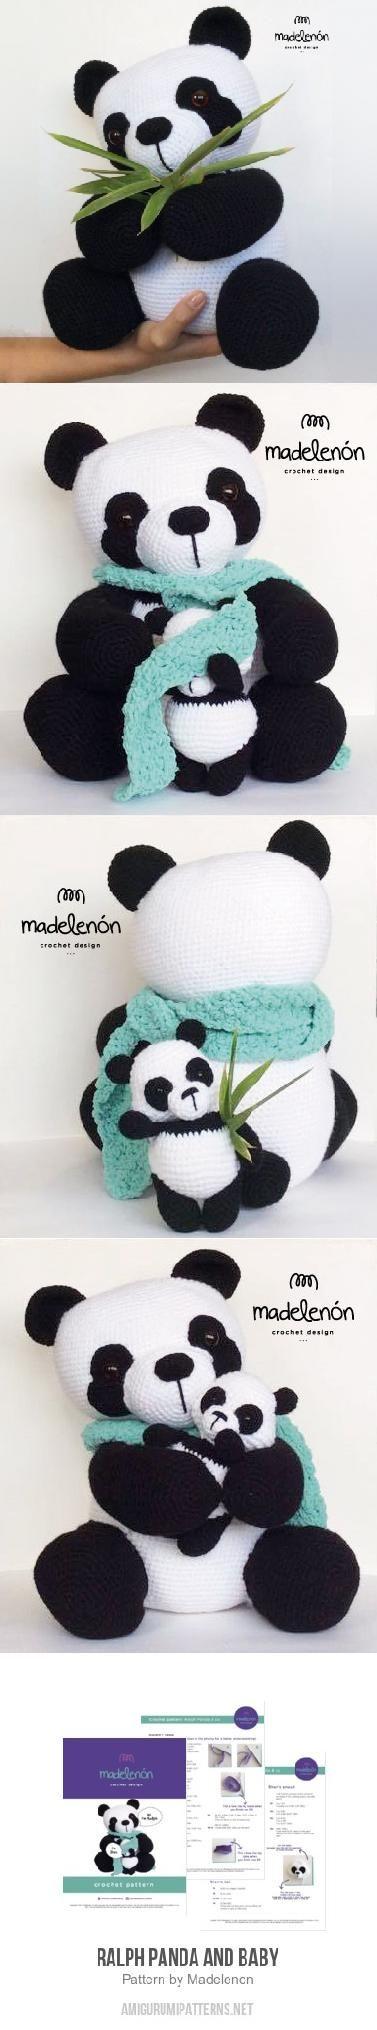 Ralph Panda and Baby amigurumi pattern by Madelenon   Ganchillo ...